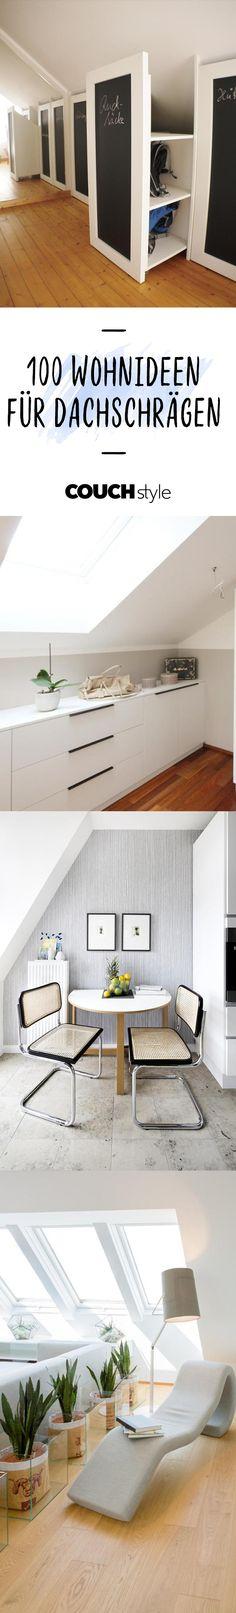 Image result for industrial design hat display ideas Display - unter 100 wohnideen